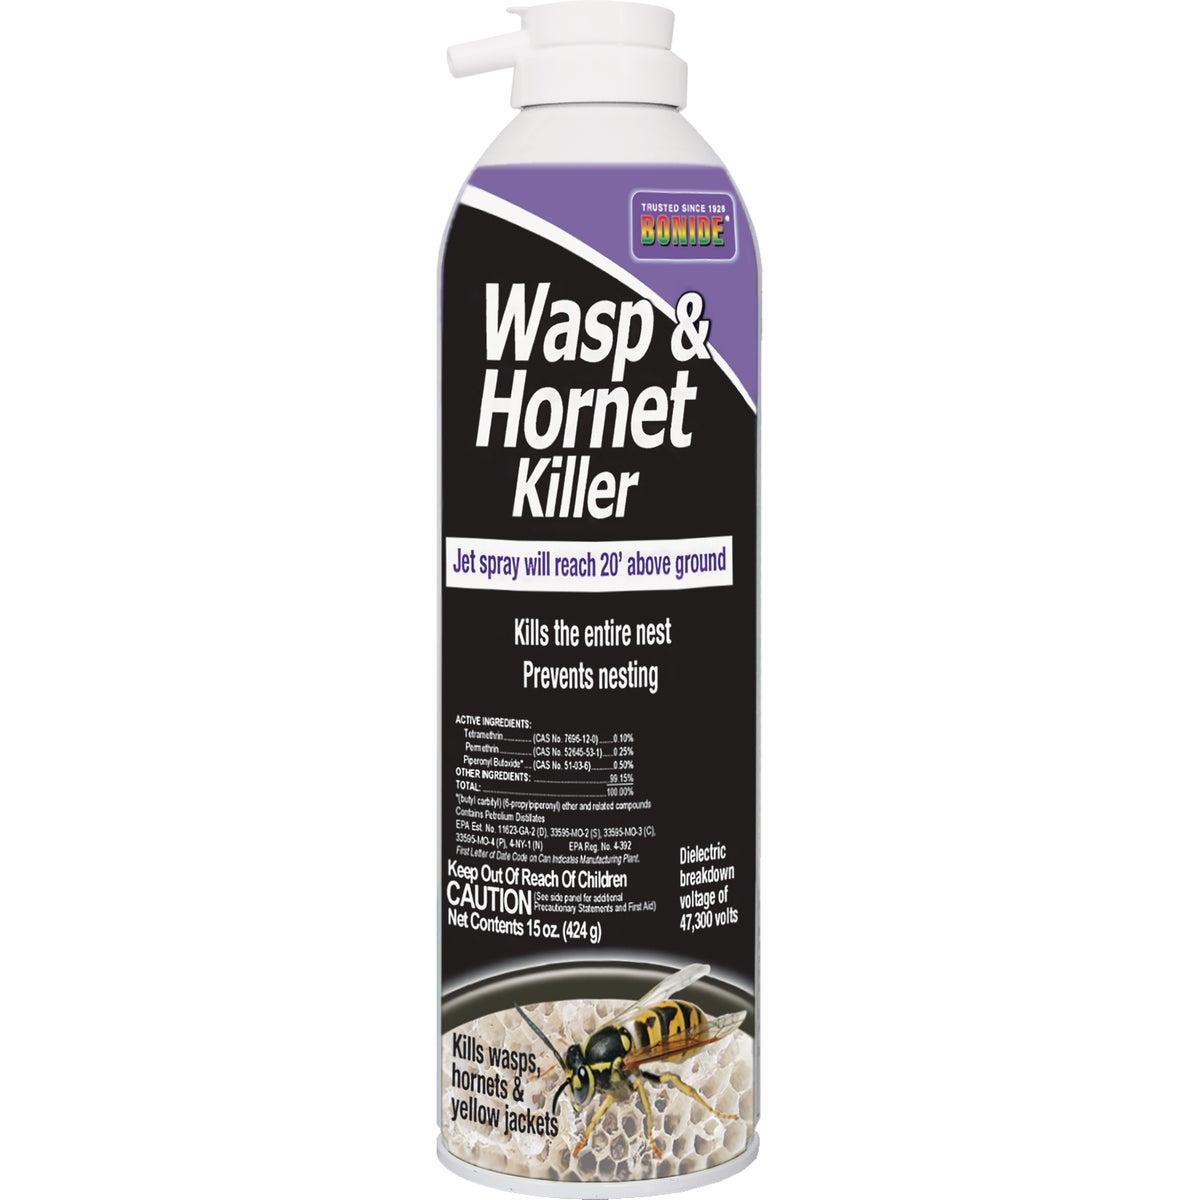 WASP & HORNET SPRAY - 631 by Bonide